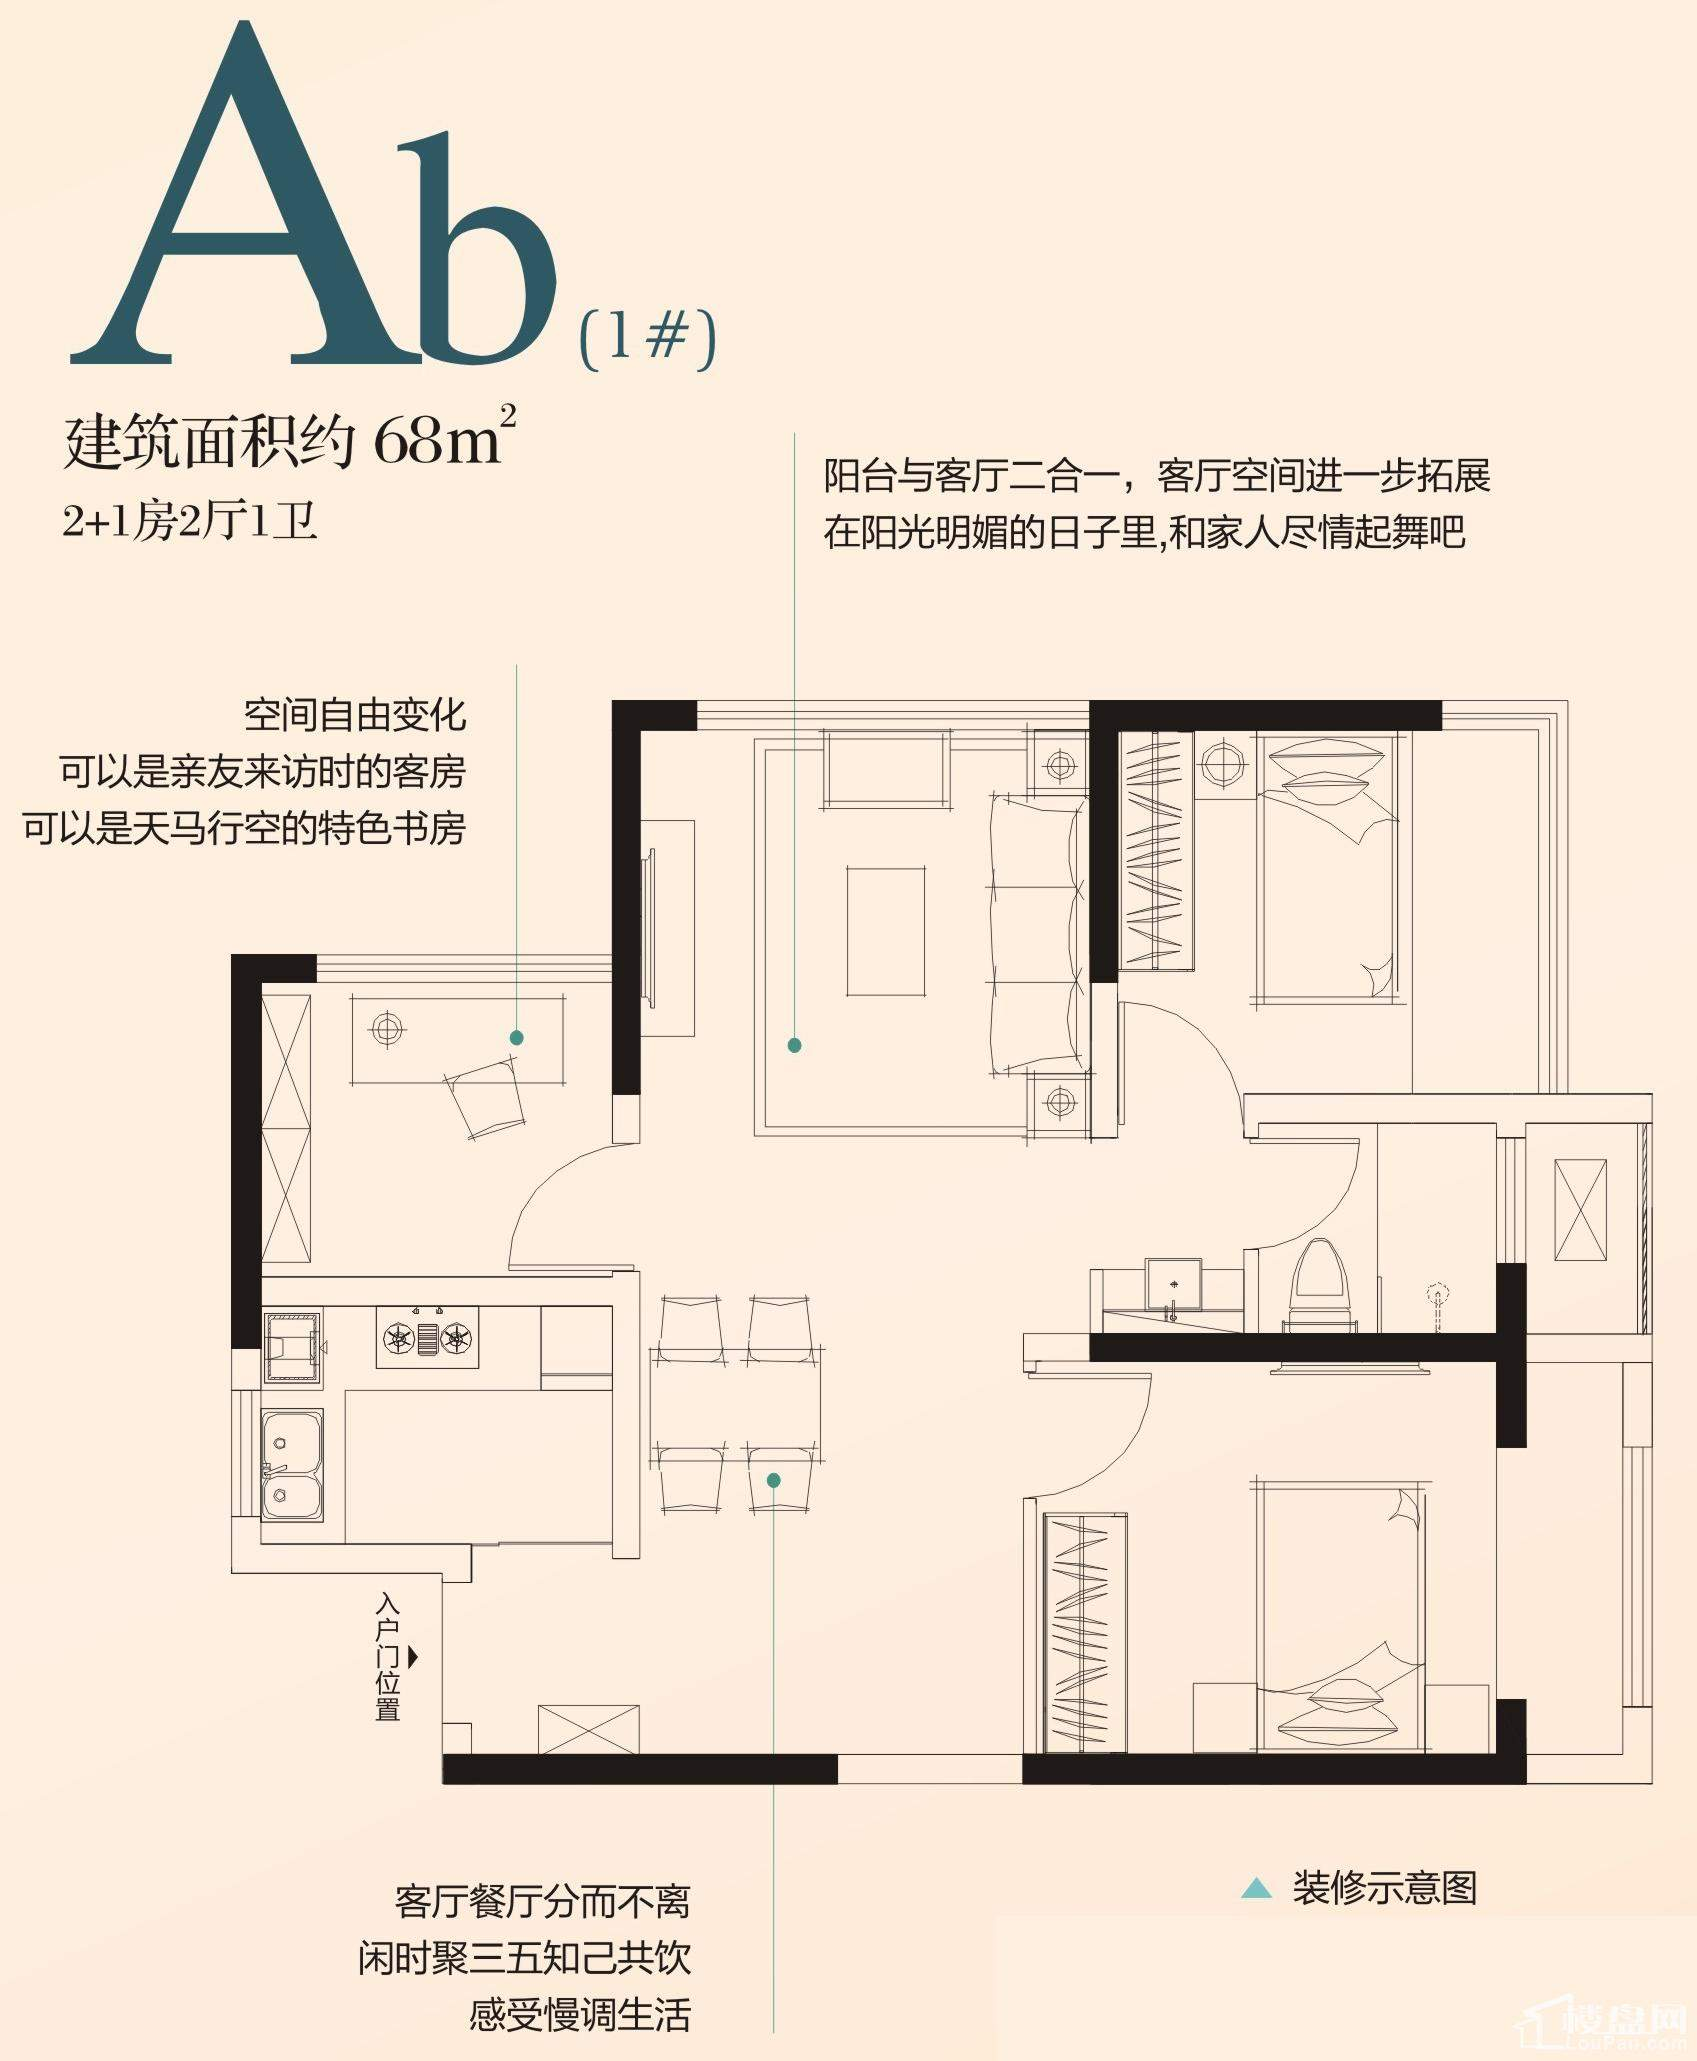 Ab户型(1#)